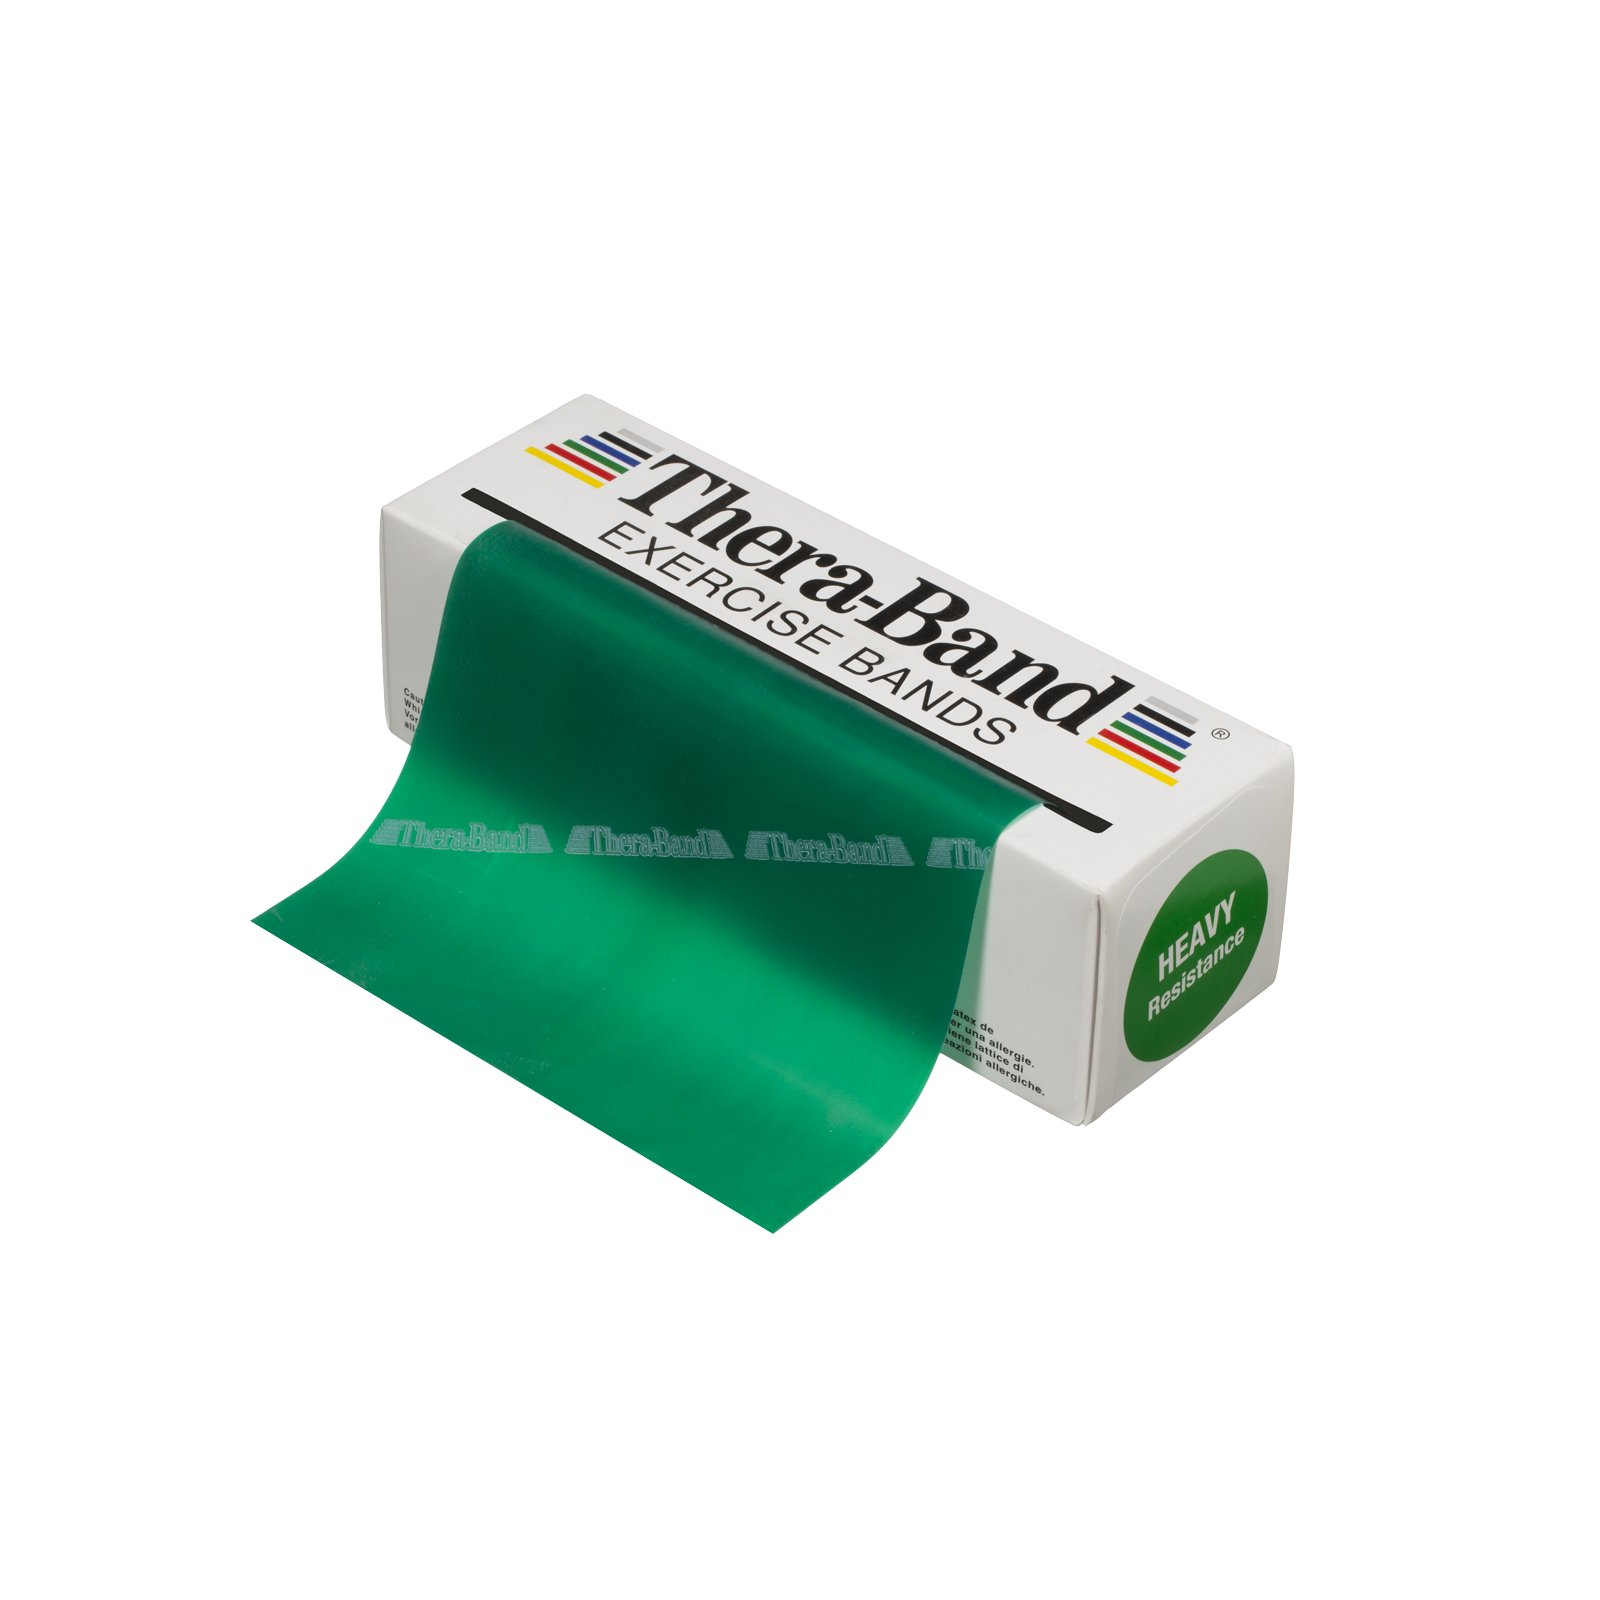 amazon com pleurx 1000 ml drainage kit pack of 3 kits health